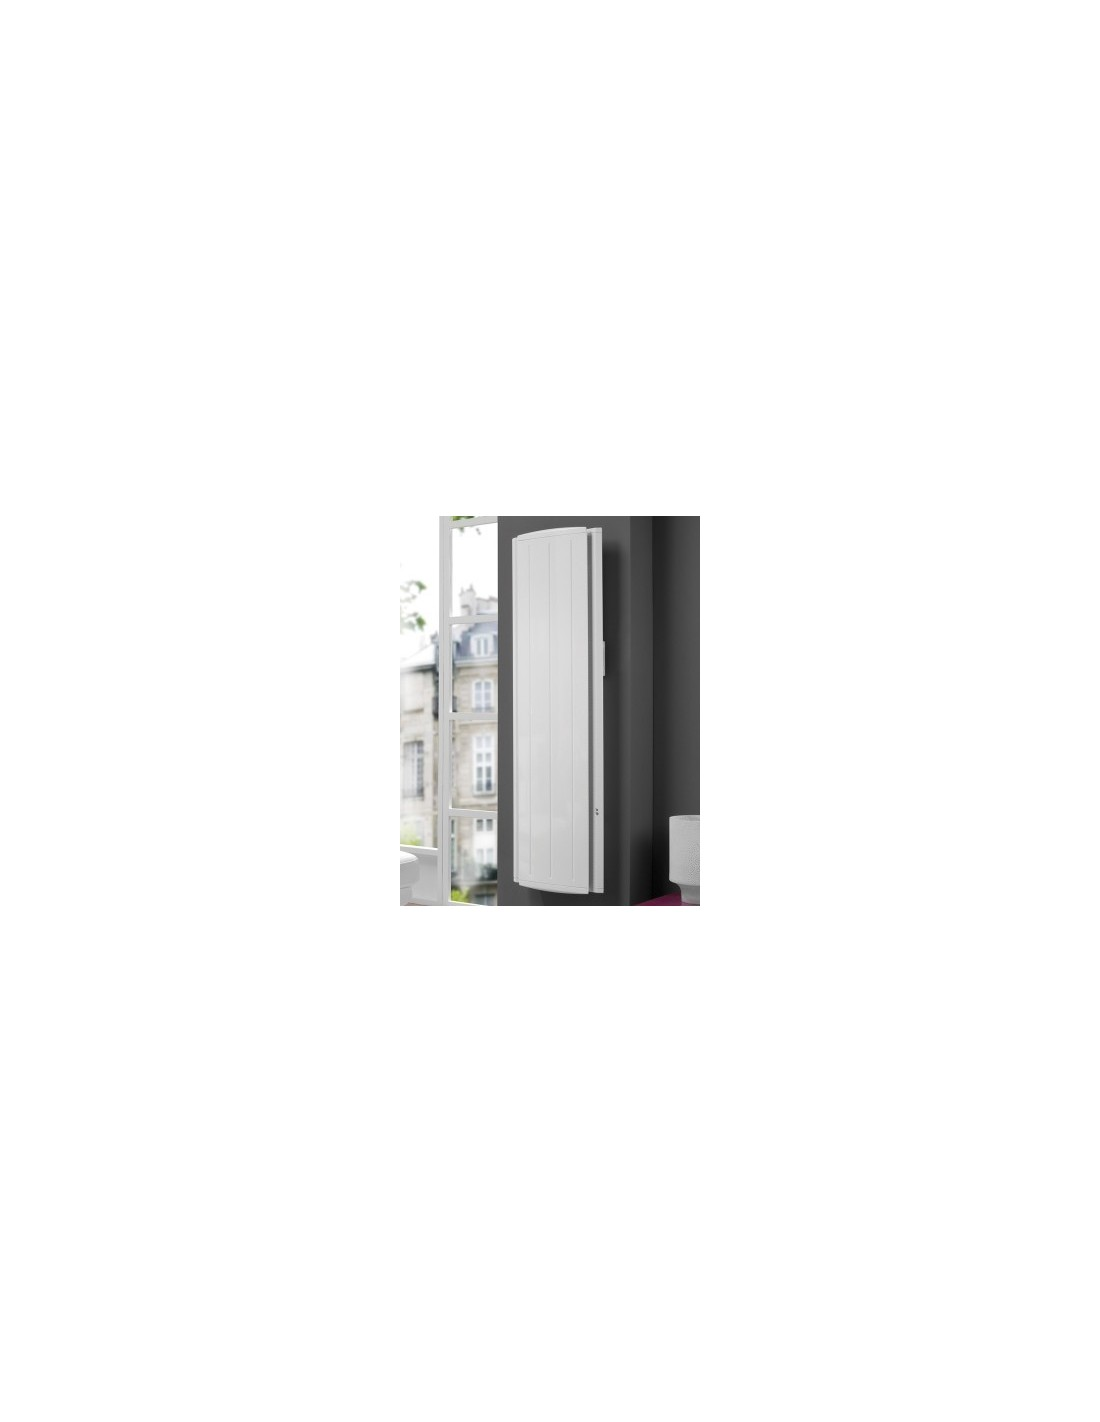 radiateur atlantic maradja vertical 2000w ebay. Black Bedroom Furniture Sets. Home Design Ideas